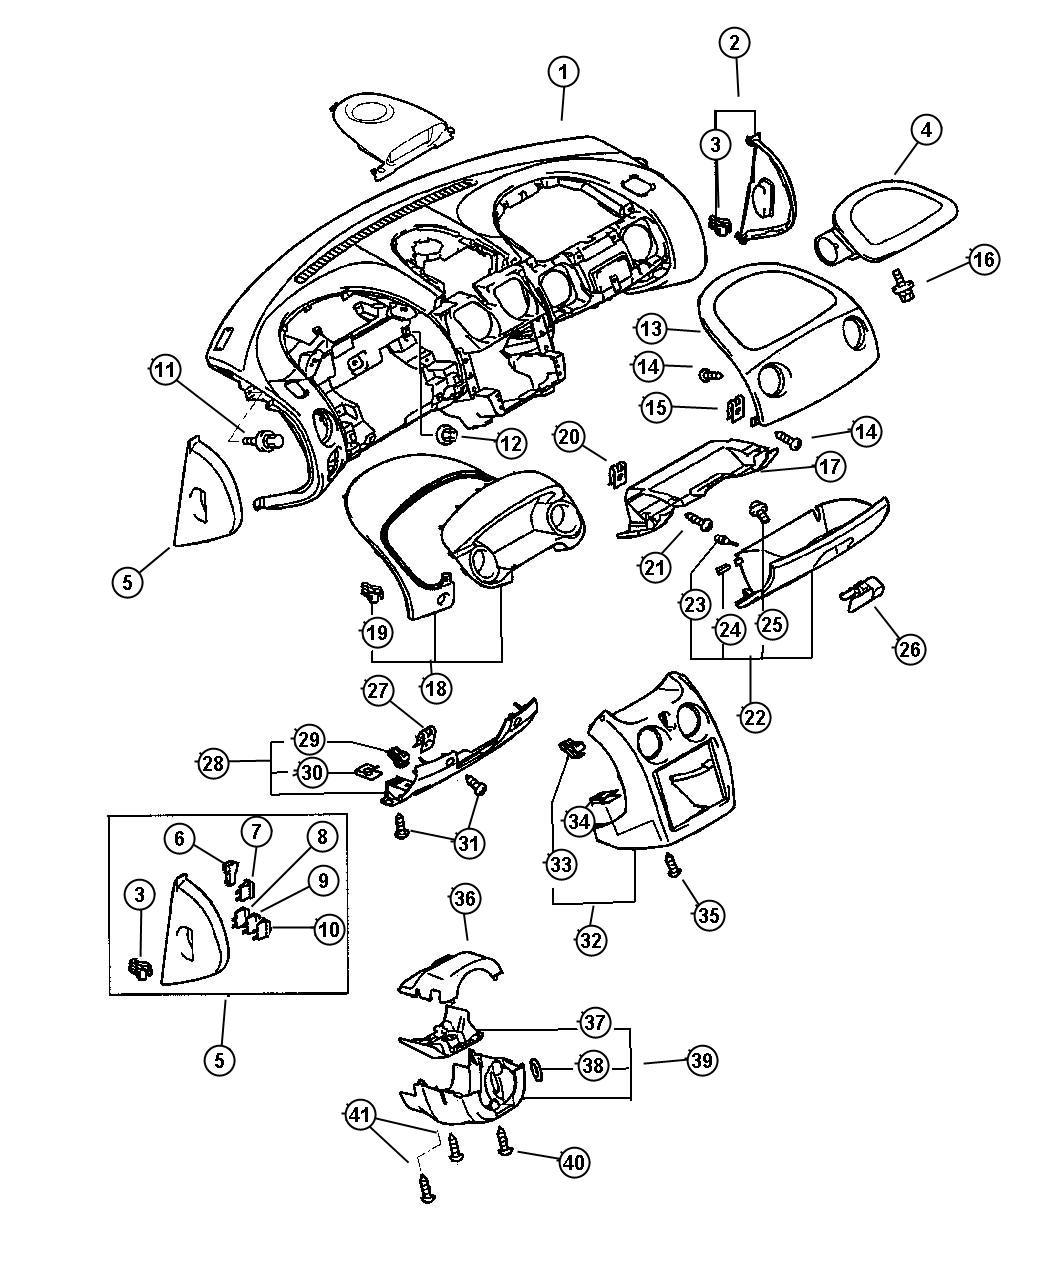 Dodge Stratus Air Bag Passenger Electrical